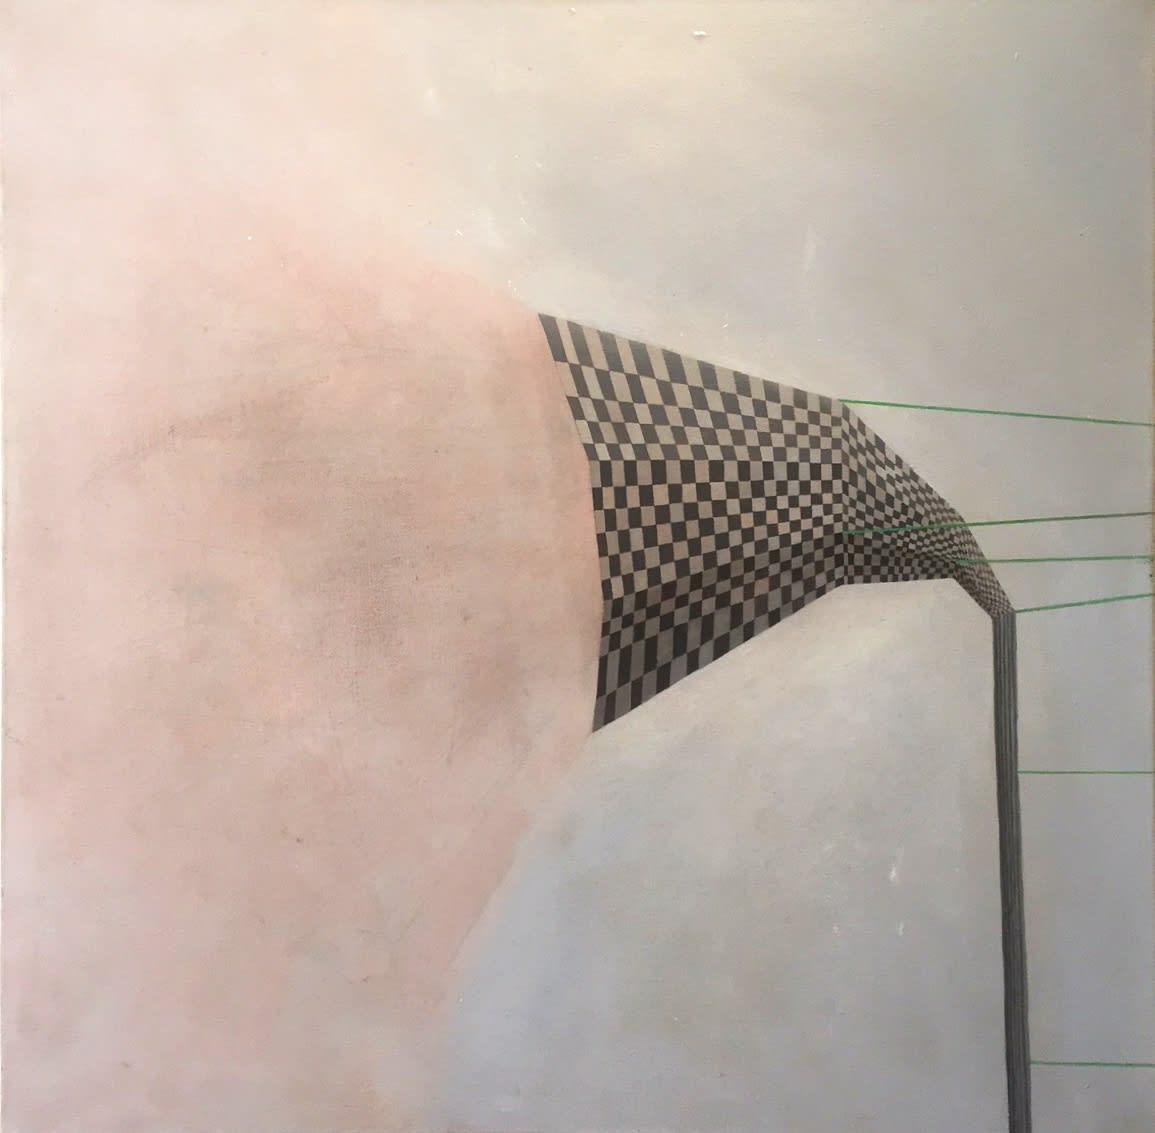 Gillian Lawler Vent Oil on canvas 80 x 80 cm